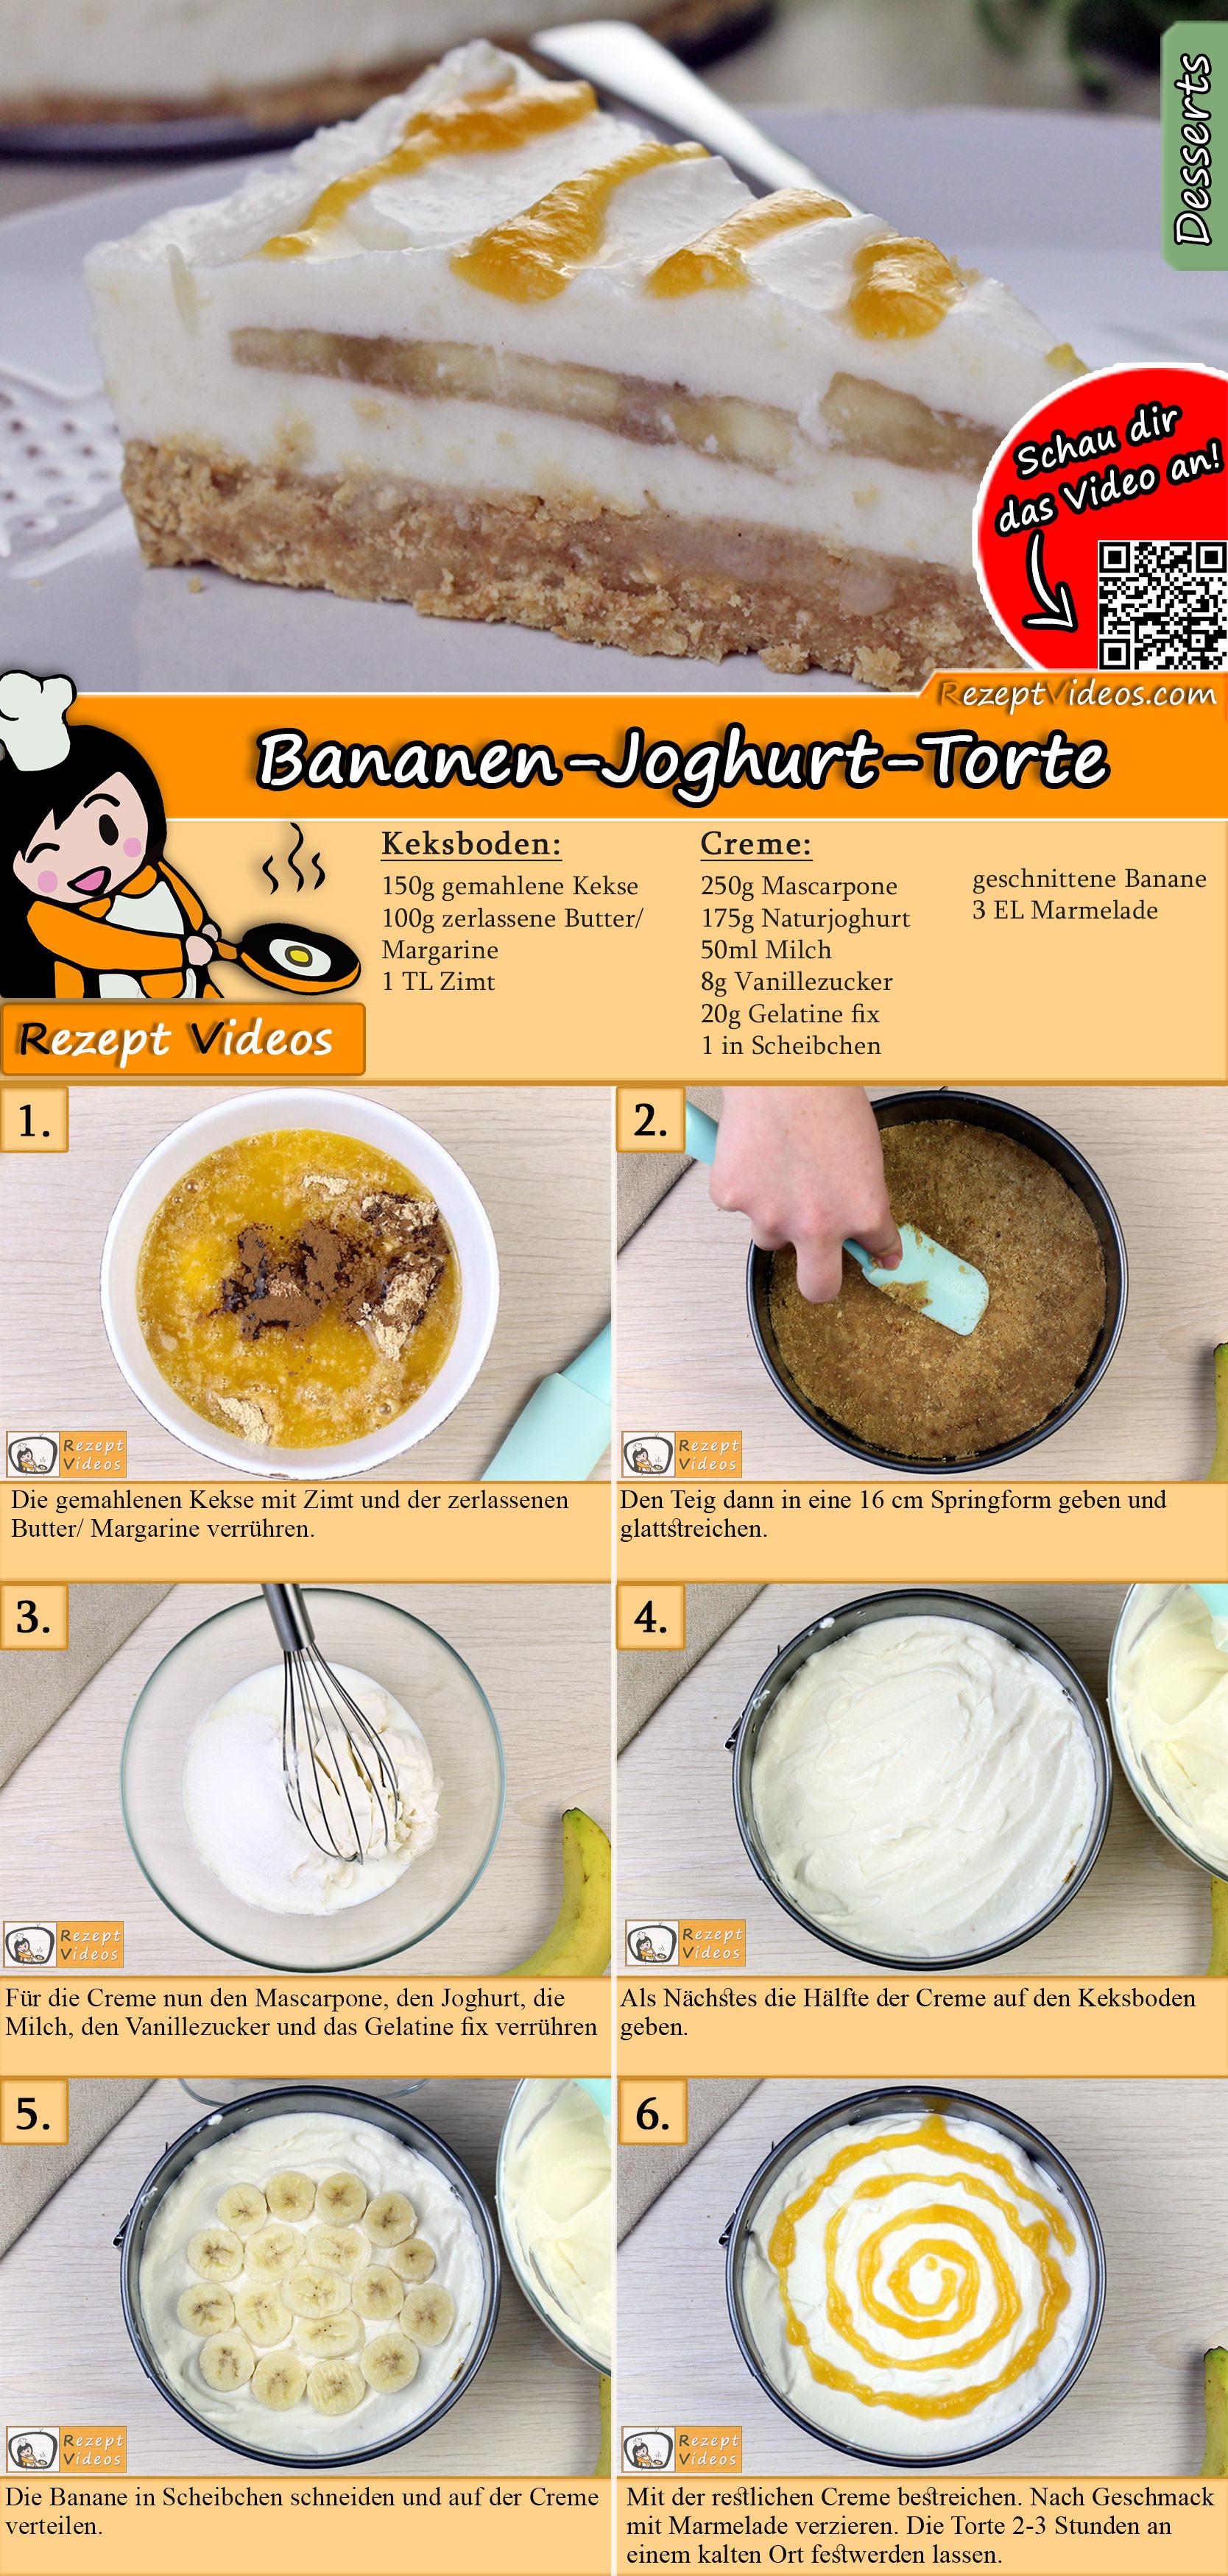 Bananen Joghurt Torte Rezept Mit Video Einfache Torten Rezepte